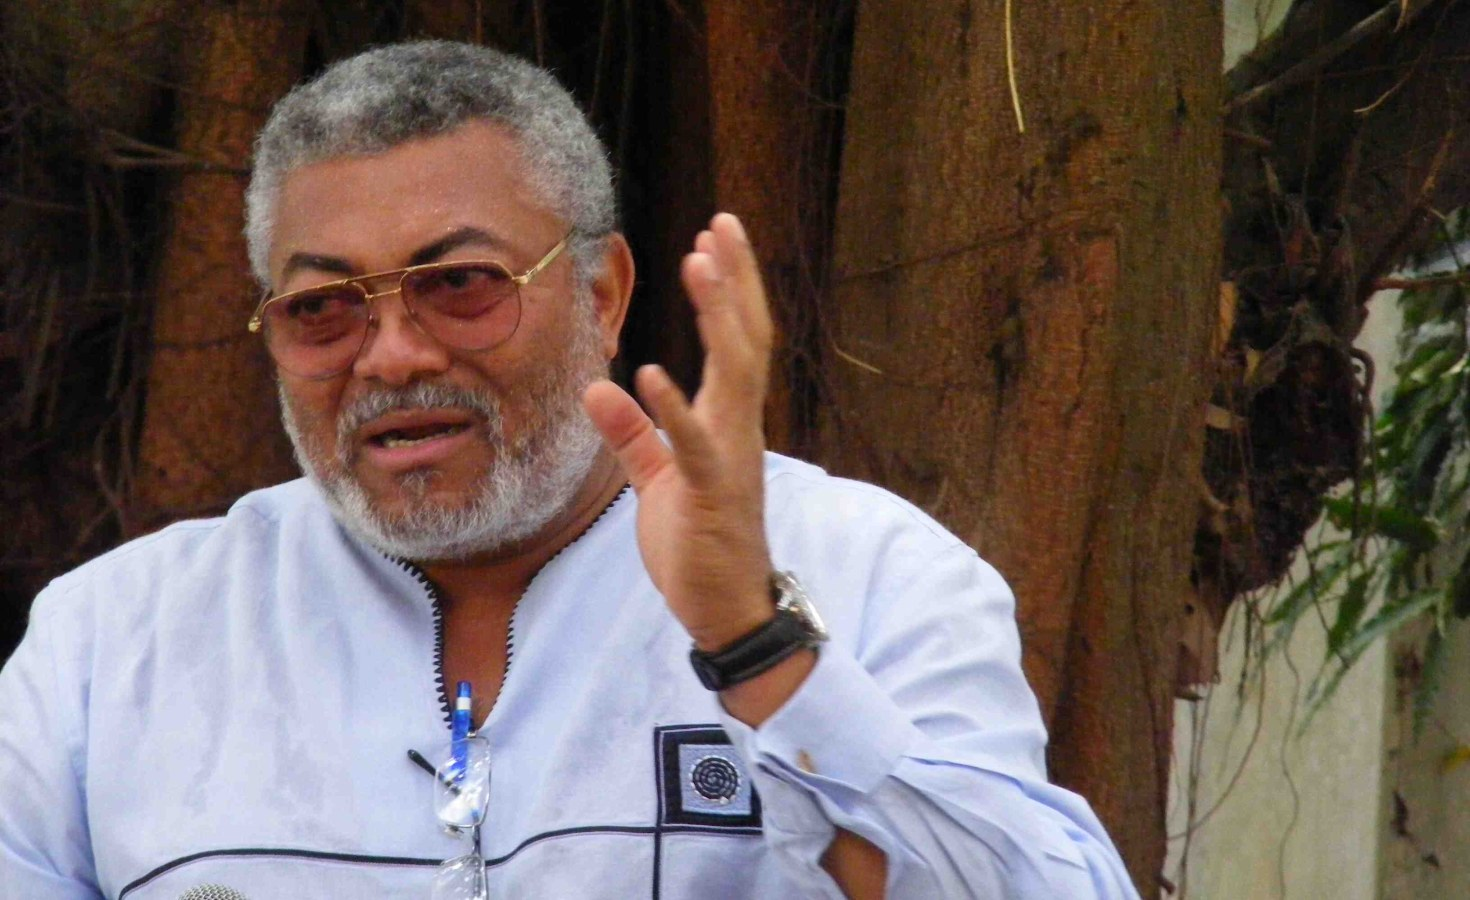 Ghana's former leader Jerry Rawlings